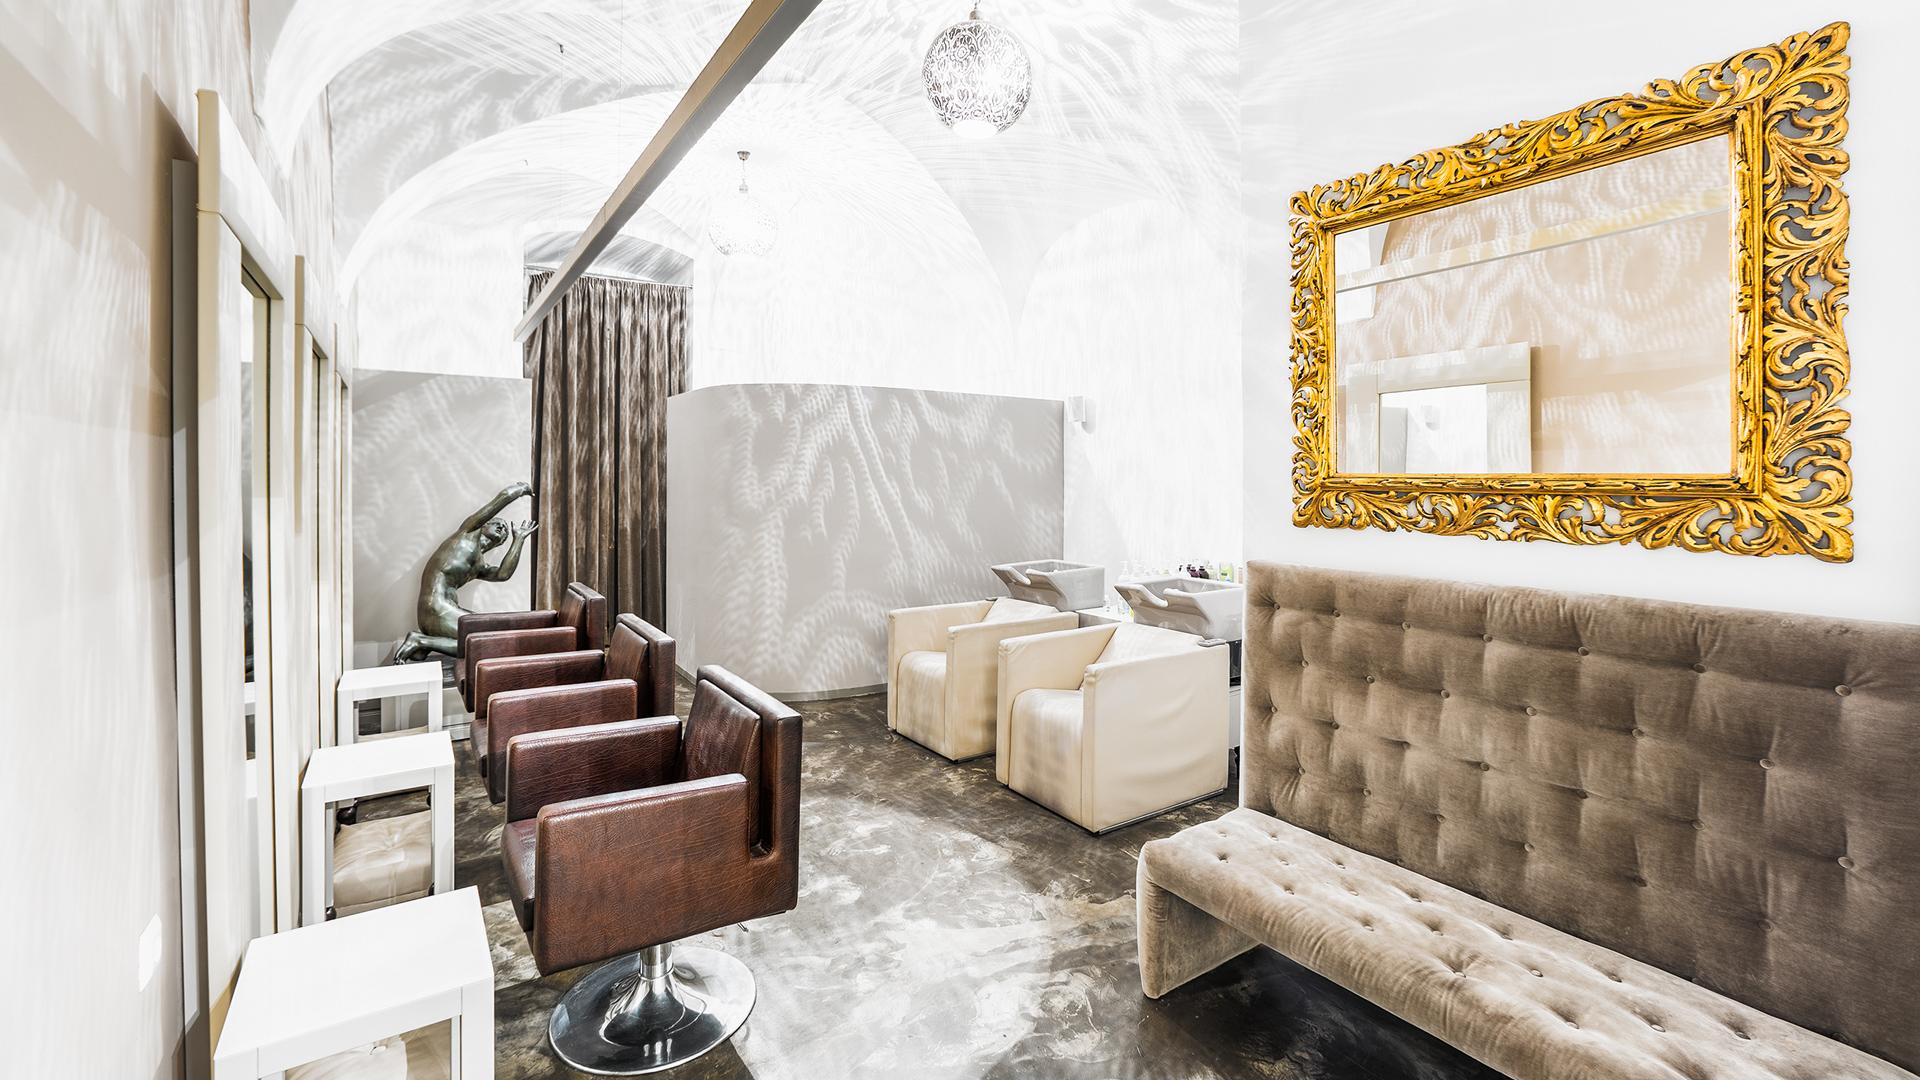 Die Wiener Friseure · Salon © Robert Tober · www.toro.cc